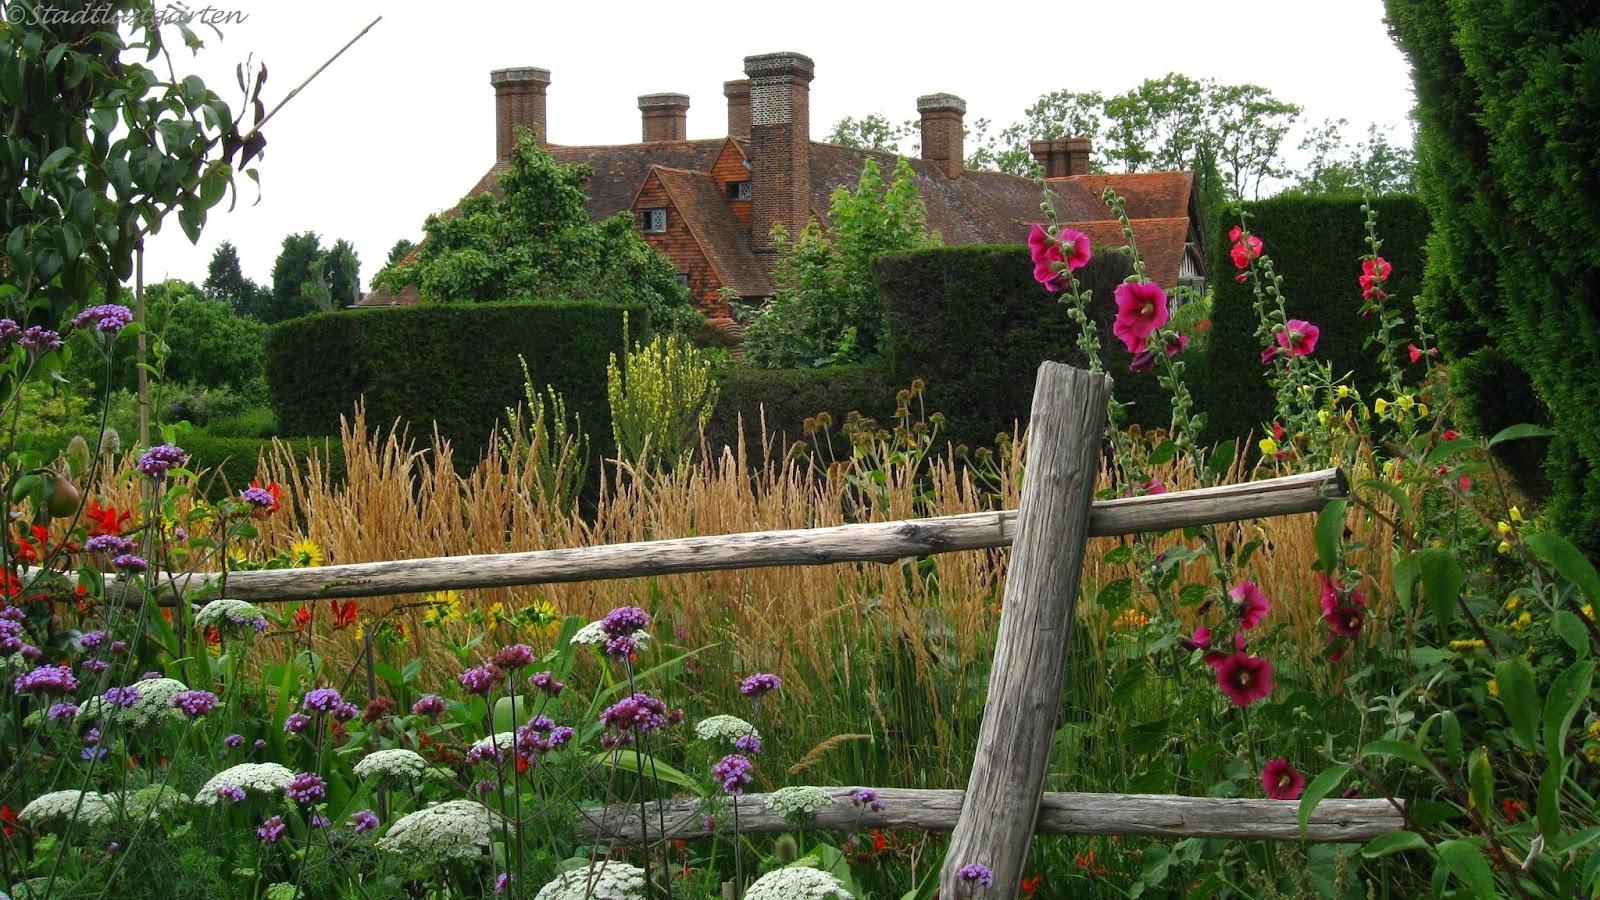 stadtlustgarten englische g rten great dixter house and garden sussex. Black Bedroom Furniture Sets. Home Design Ideas